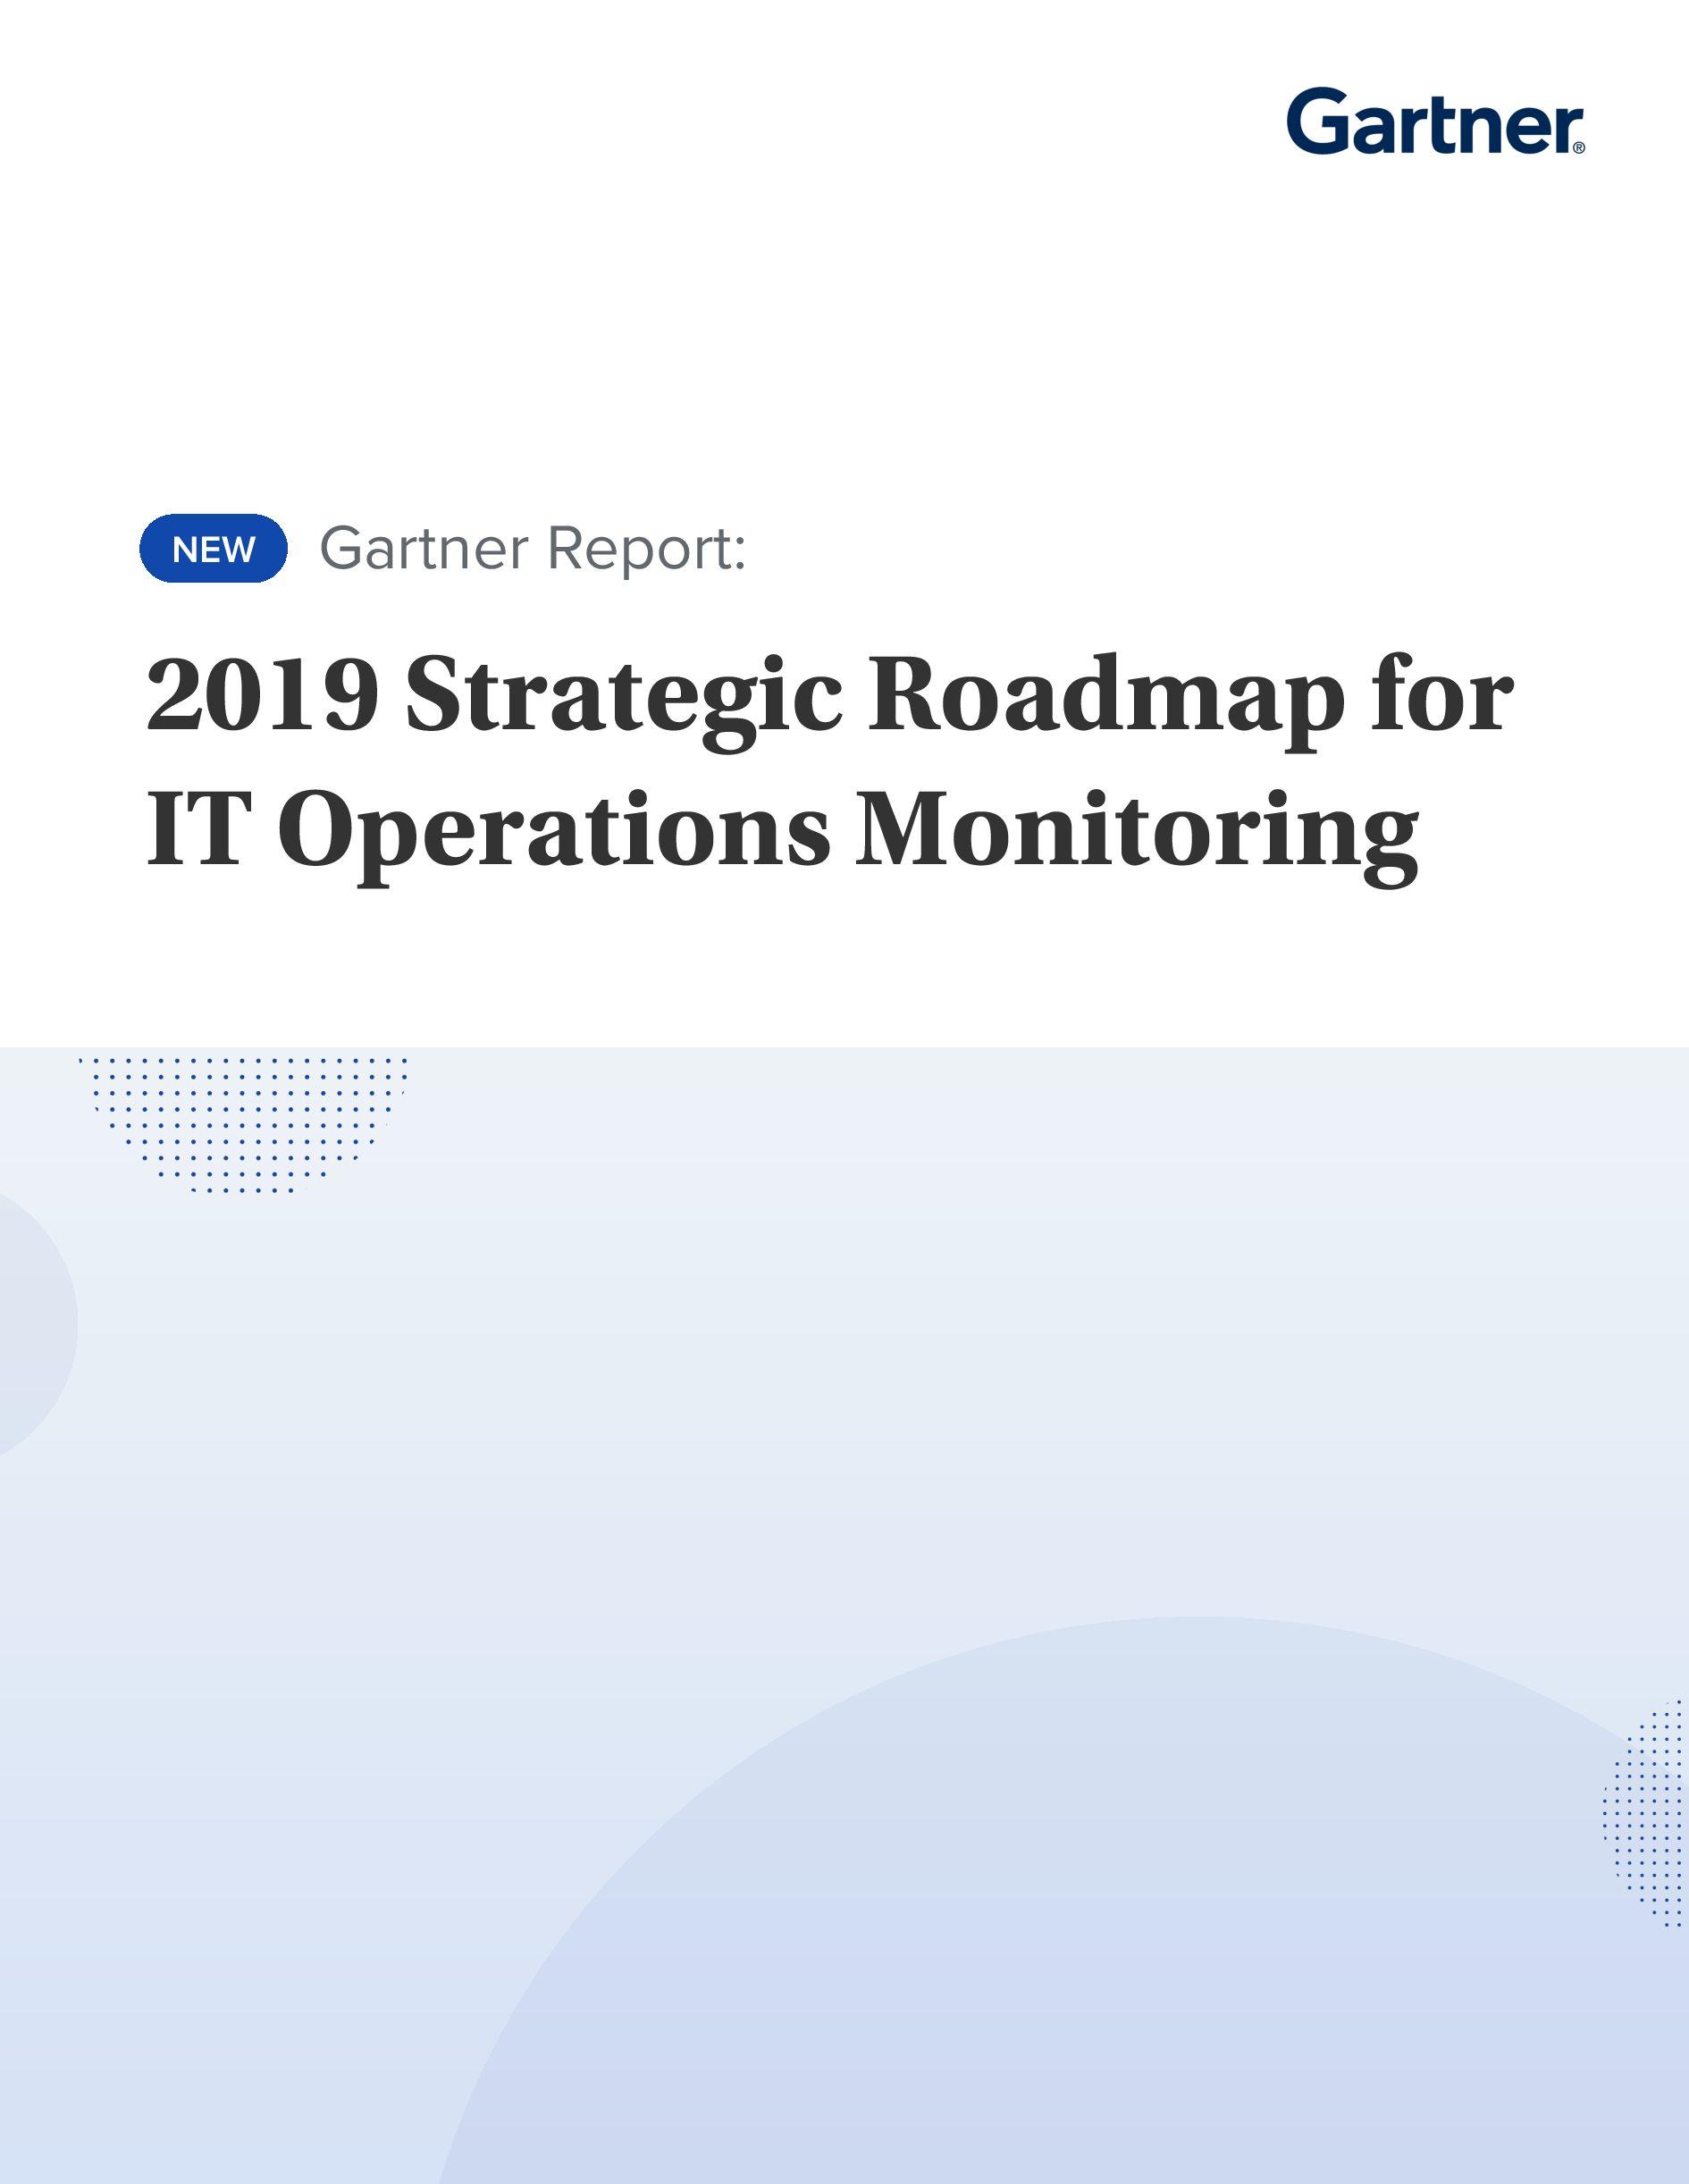 Gartner: 2019 Strategic Roadmap for IT Operations Monitoring